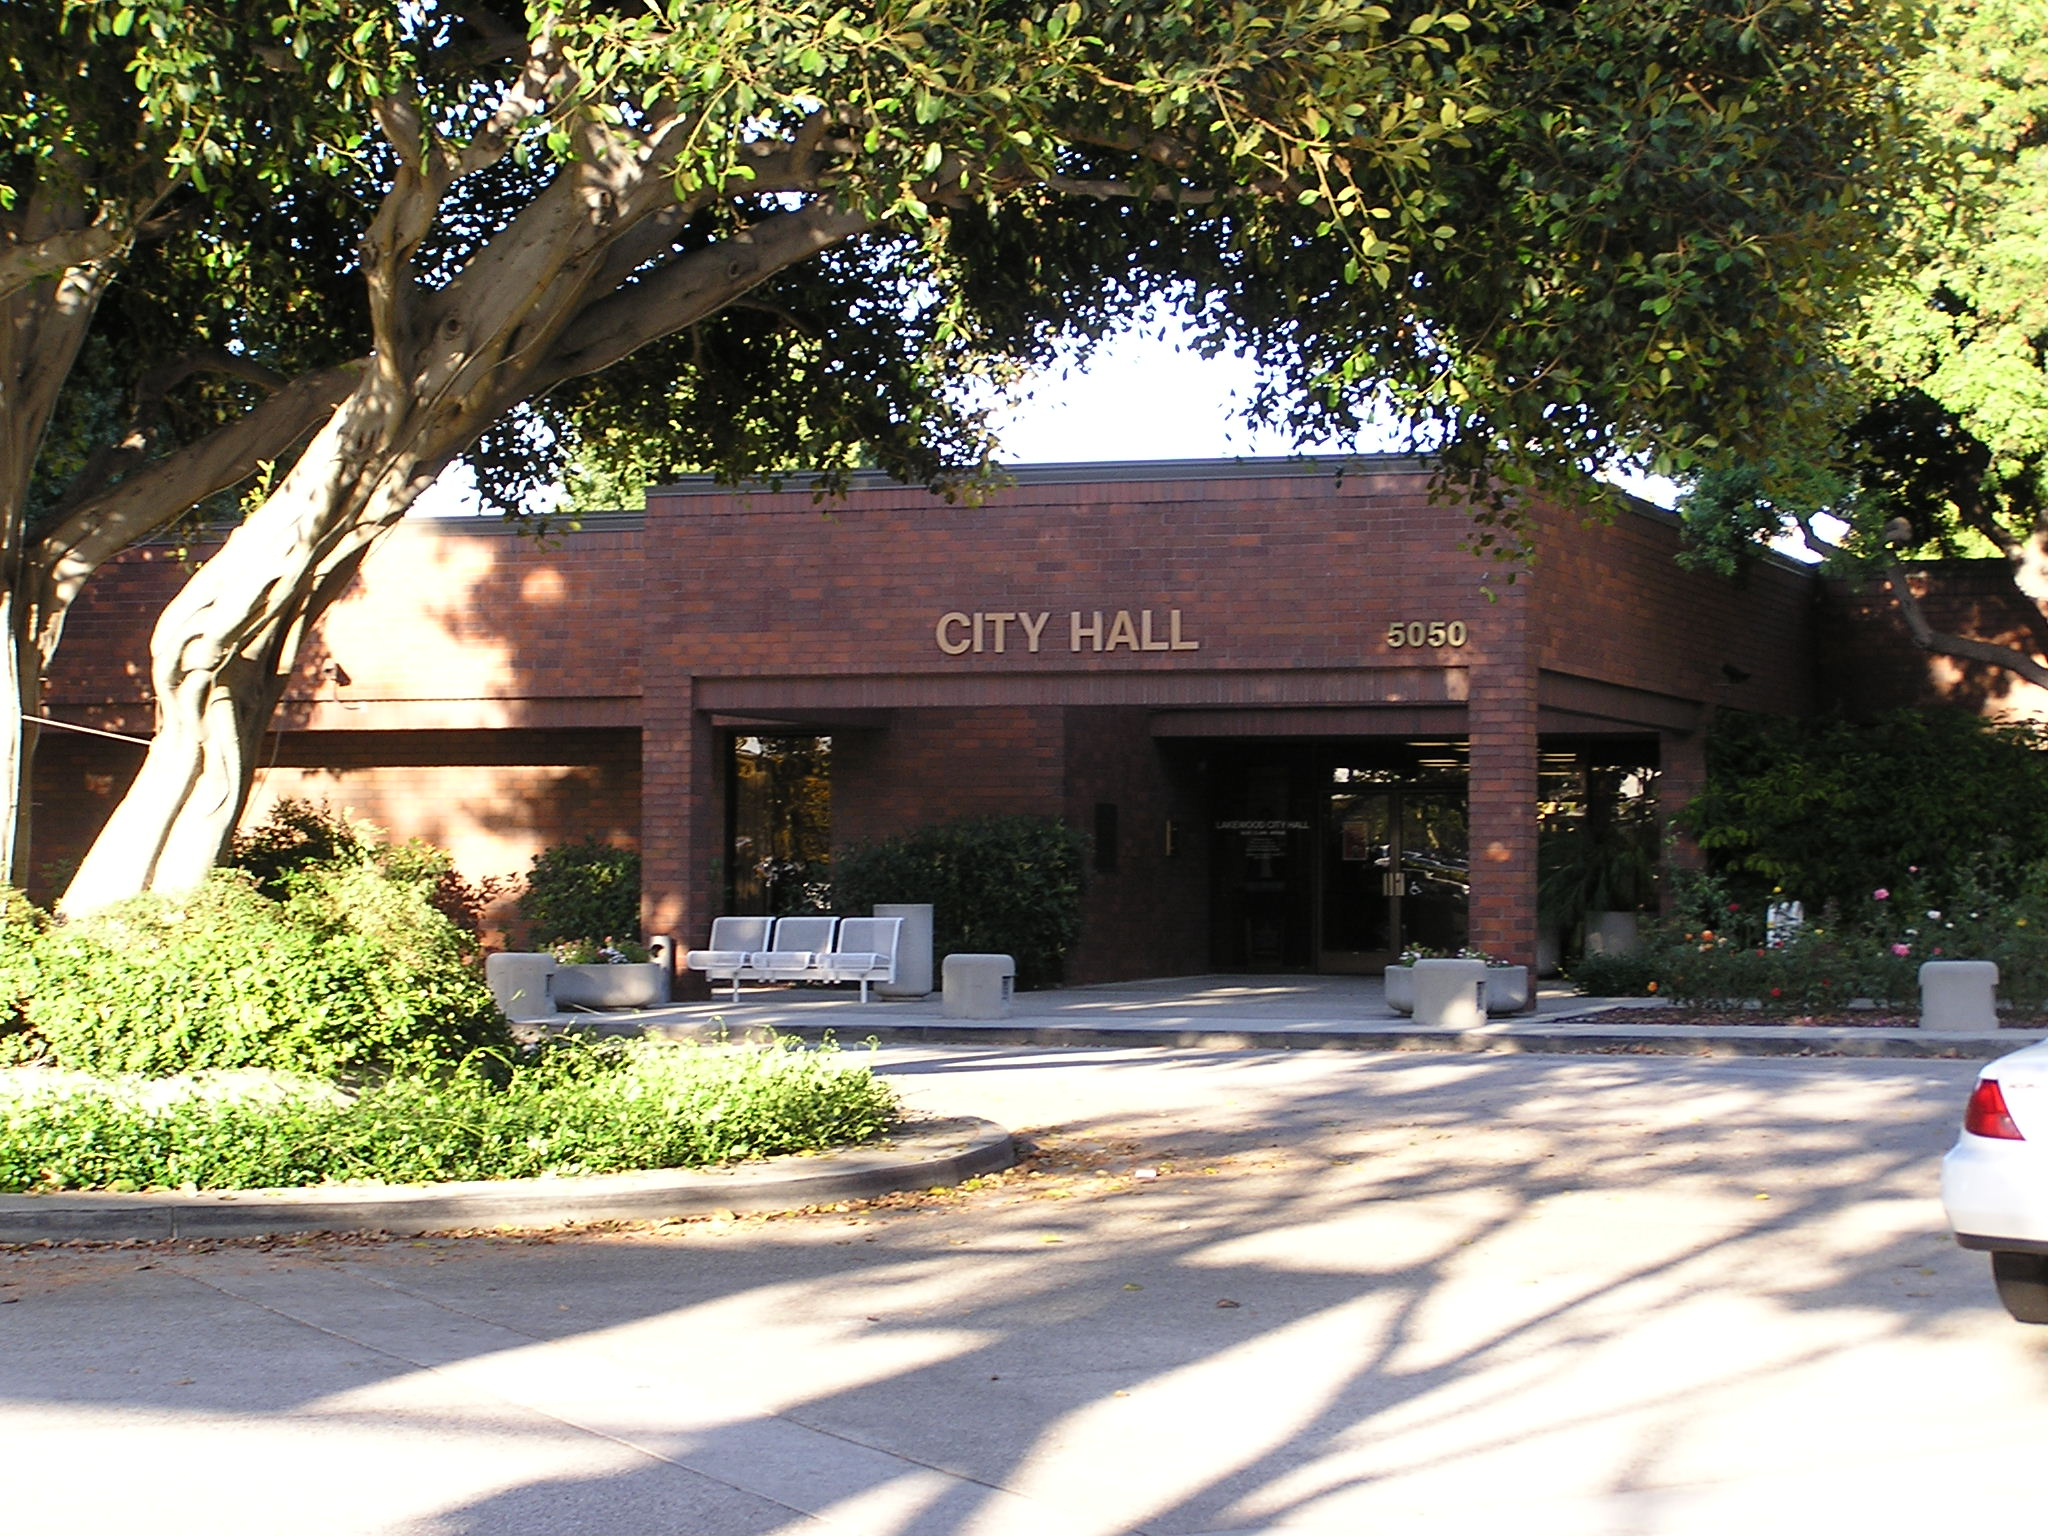 File:Lakewood ca city hall.jpg - Wikimedia Commons